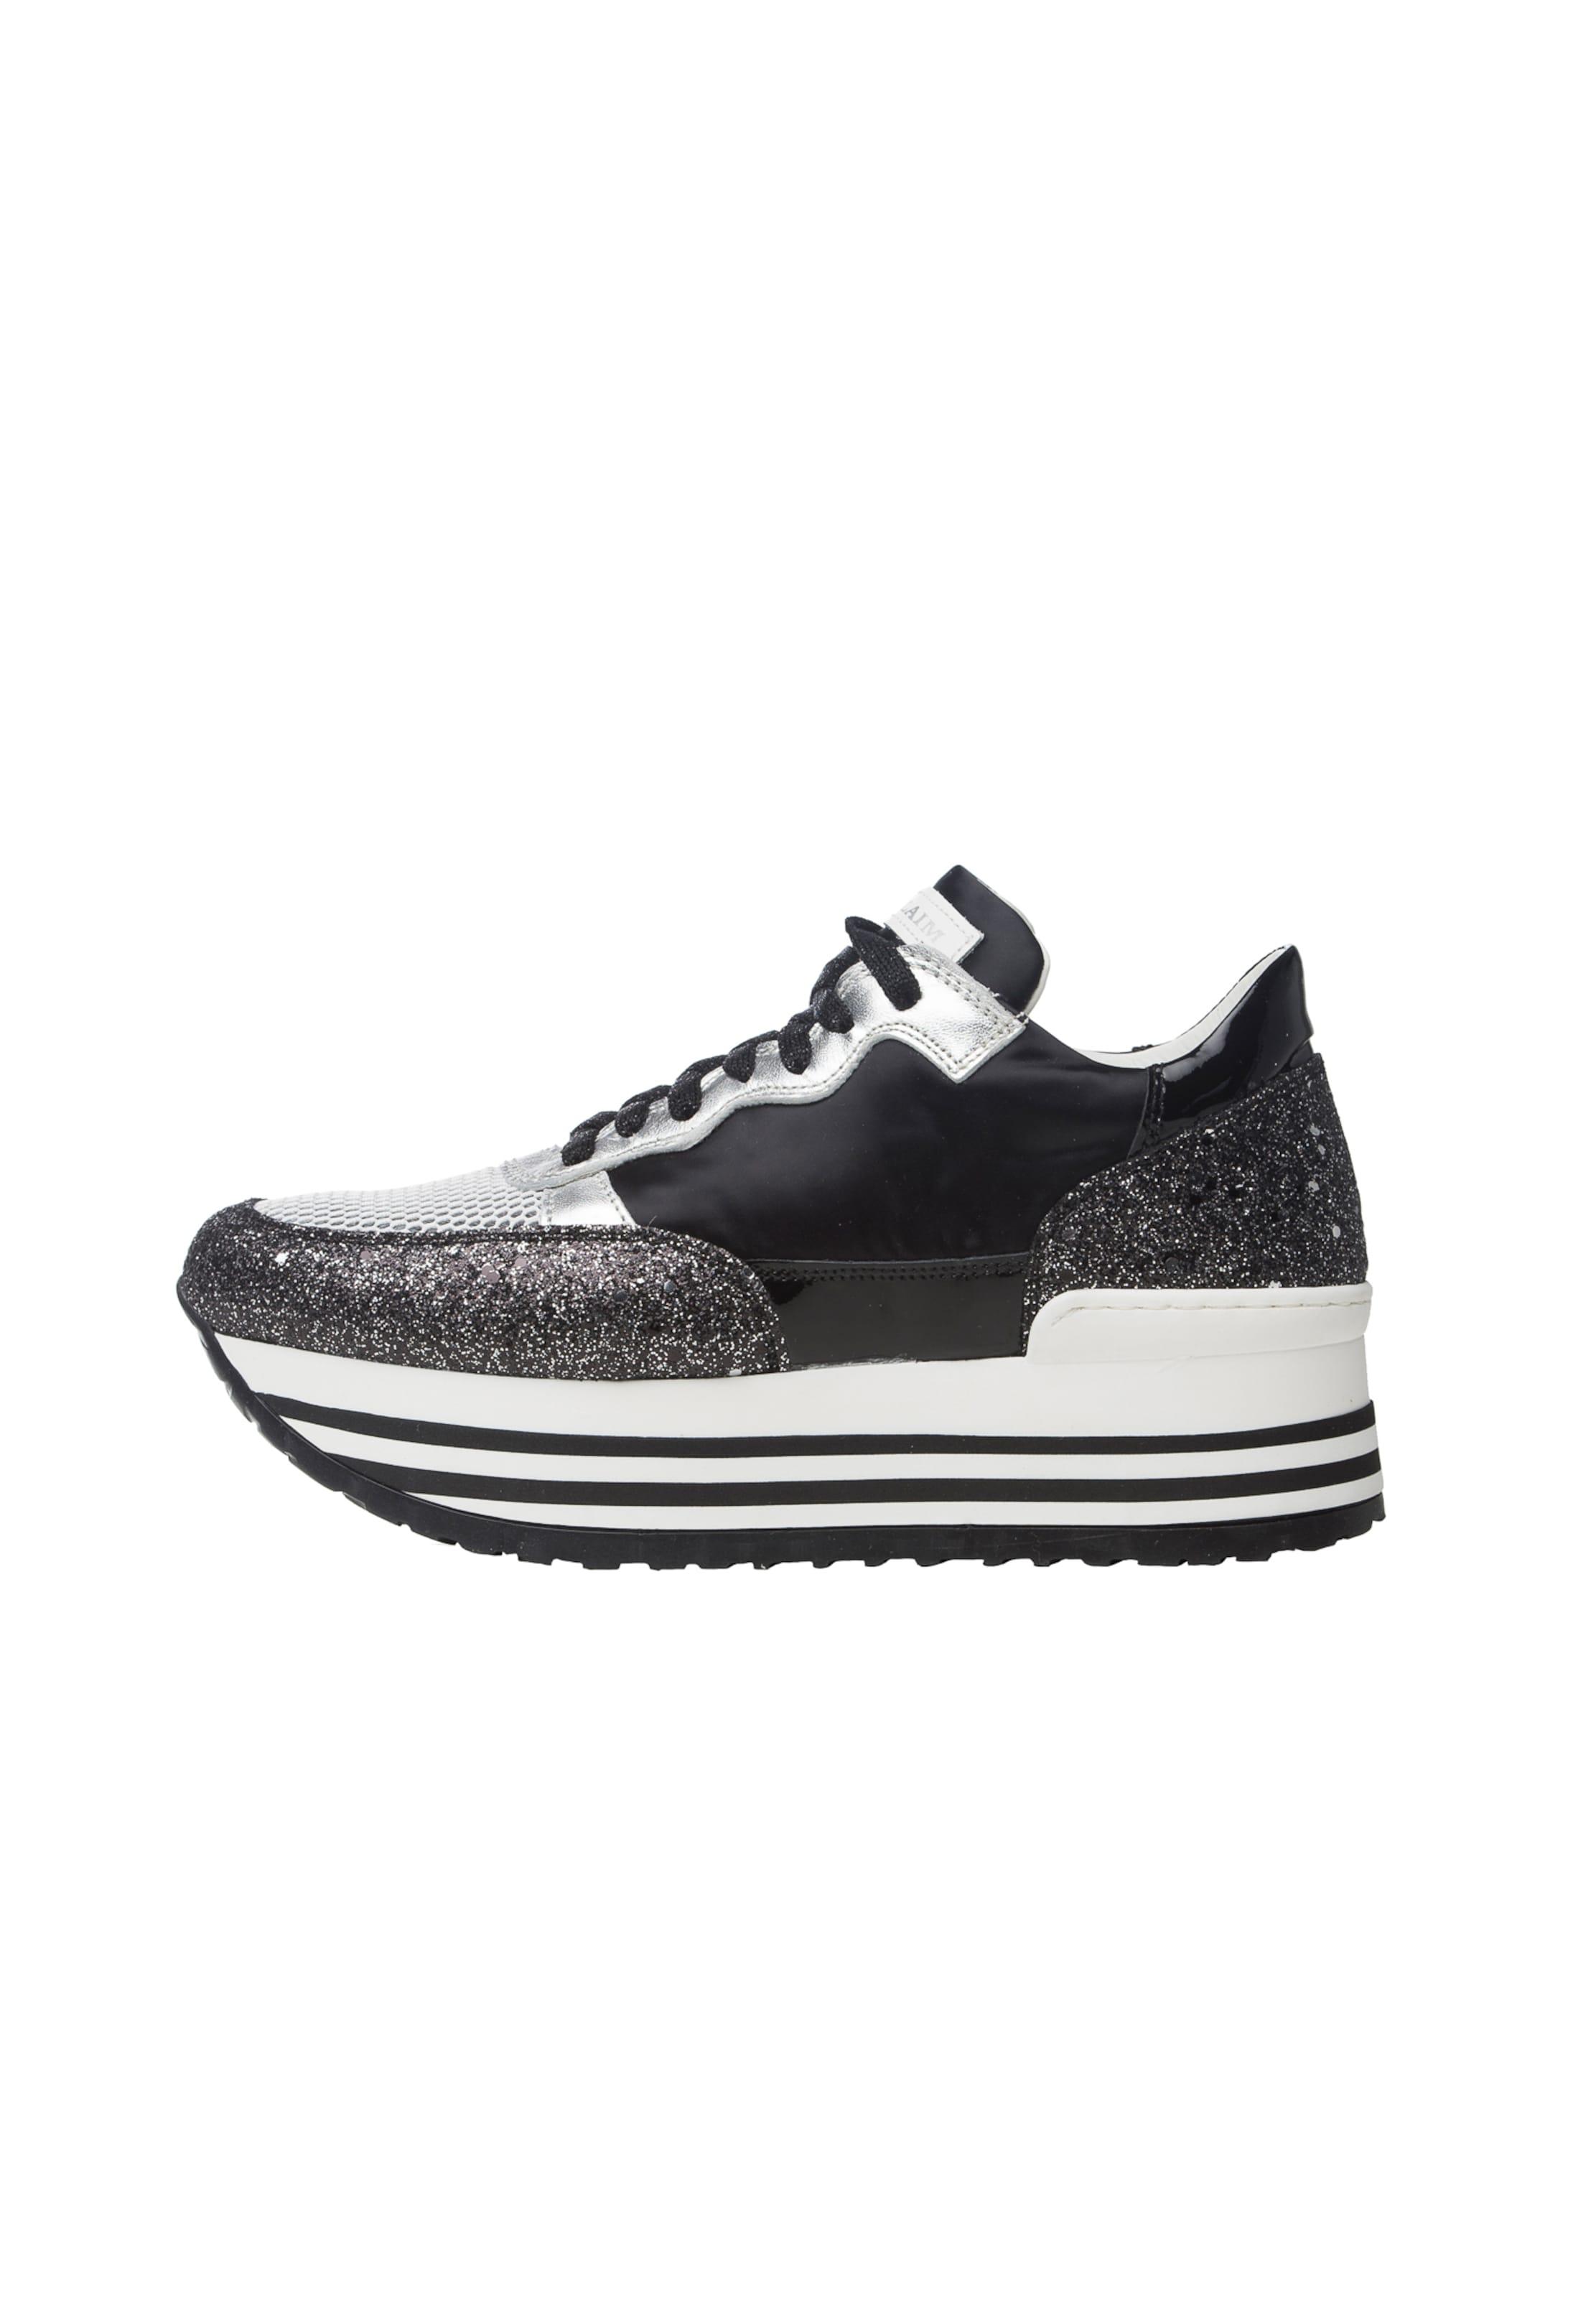 Sneaker Noclaim 1' SchwarzSilber Weiß In 'marta fY76vIbyg